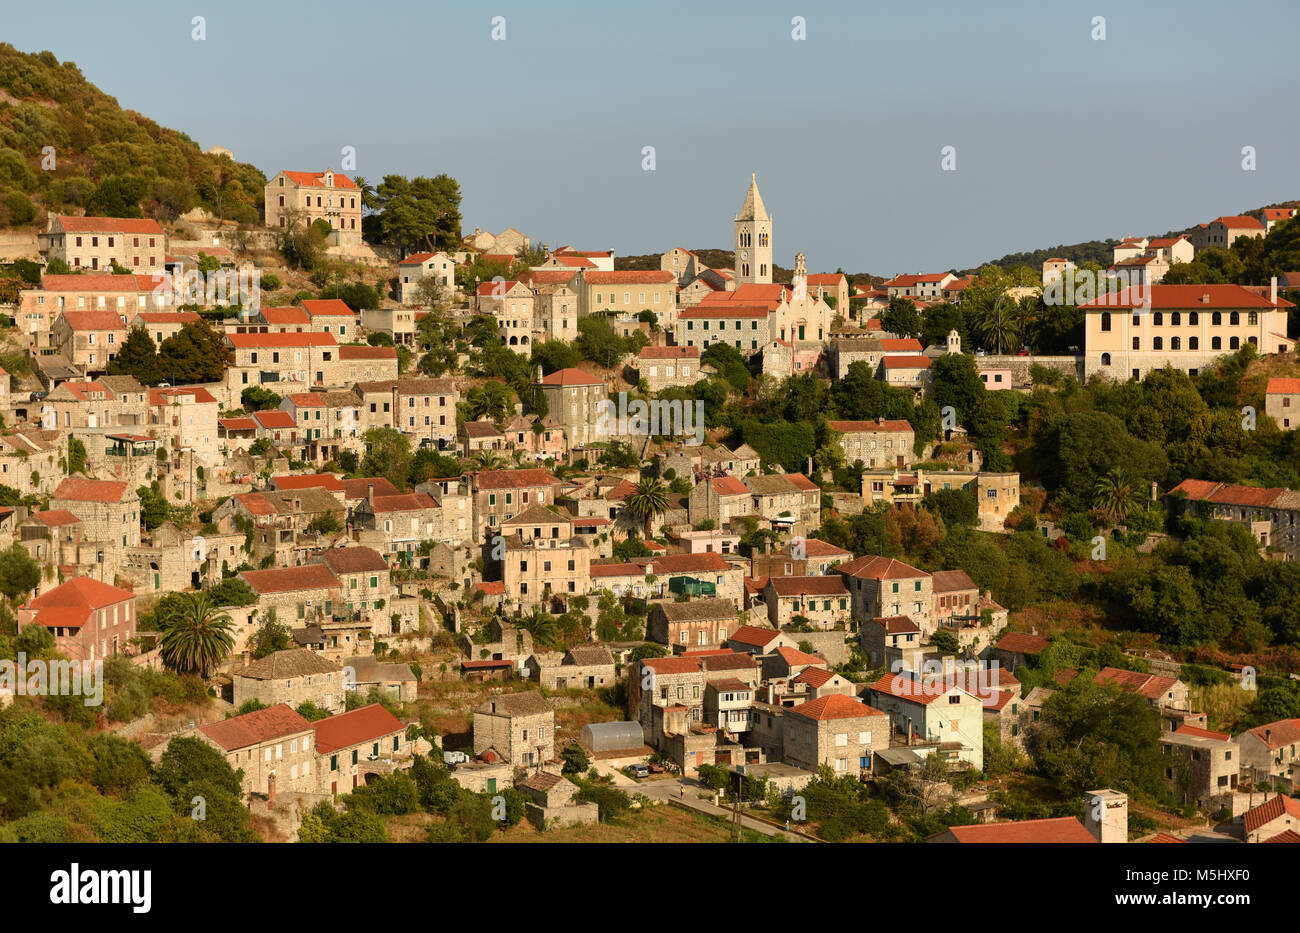 Old town Lastovo on island of Lastovo, Croatia - Stock Image